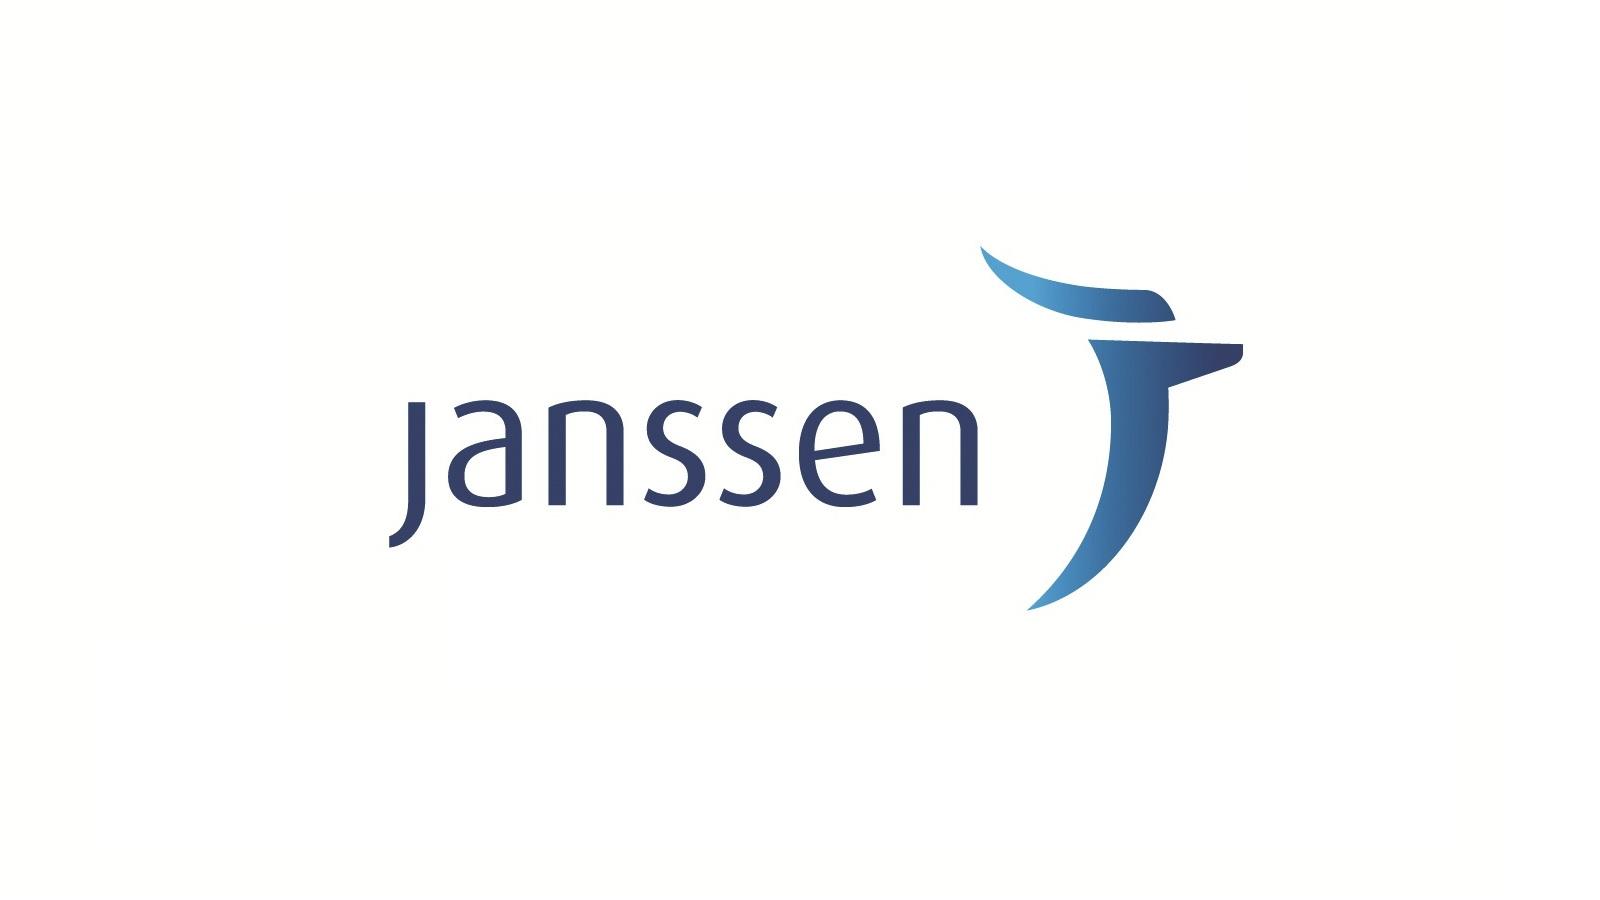 Janssen launches psoriasis drug Tremfya in UK - Pharmaphorum